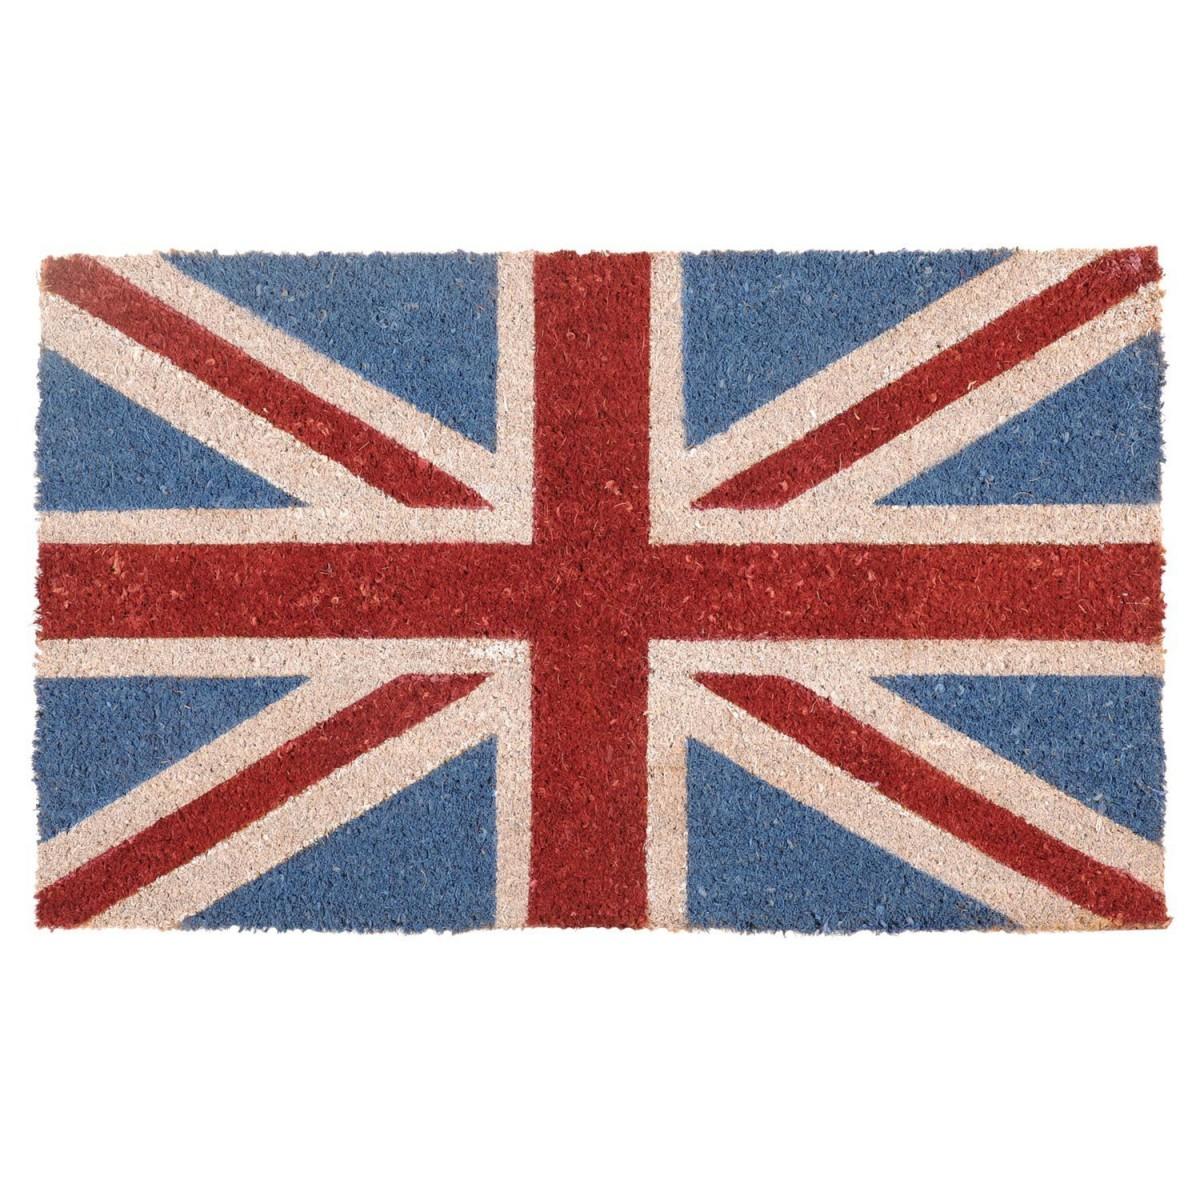 kokosfu matte englische flagge fussmatte england clayre eef. Black Bedroom Furniture Sets. Home Design Ideas